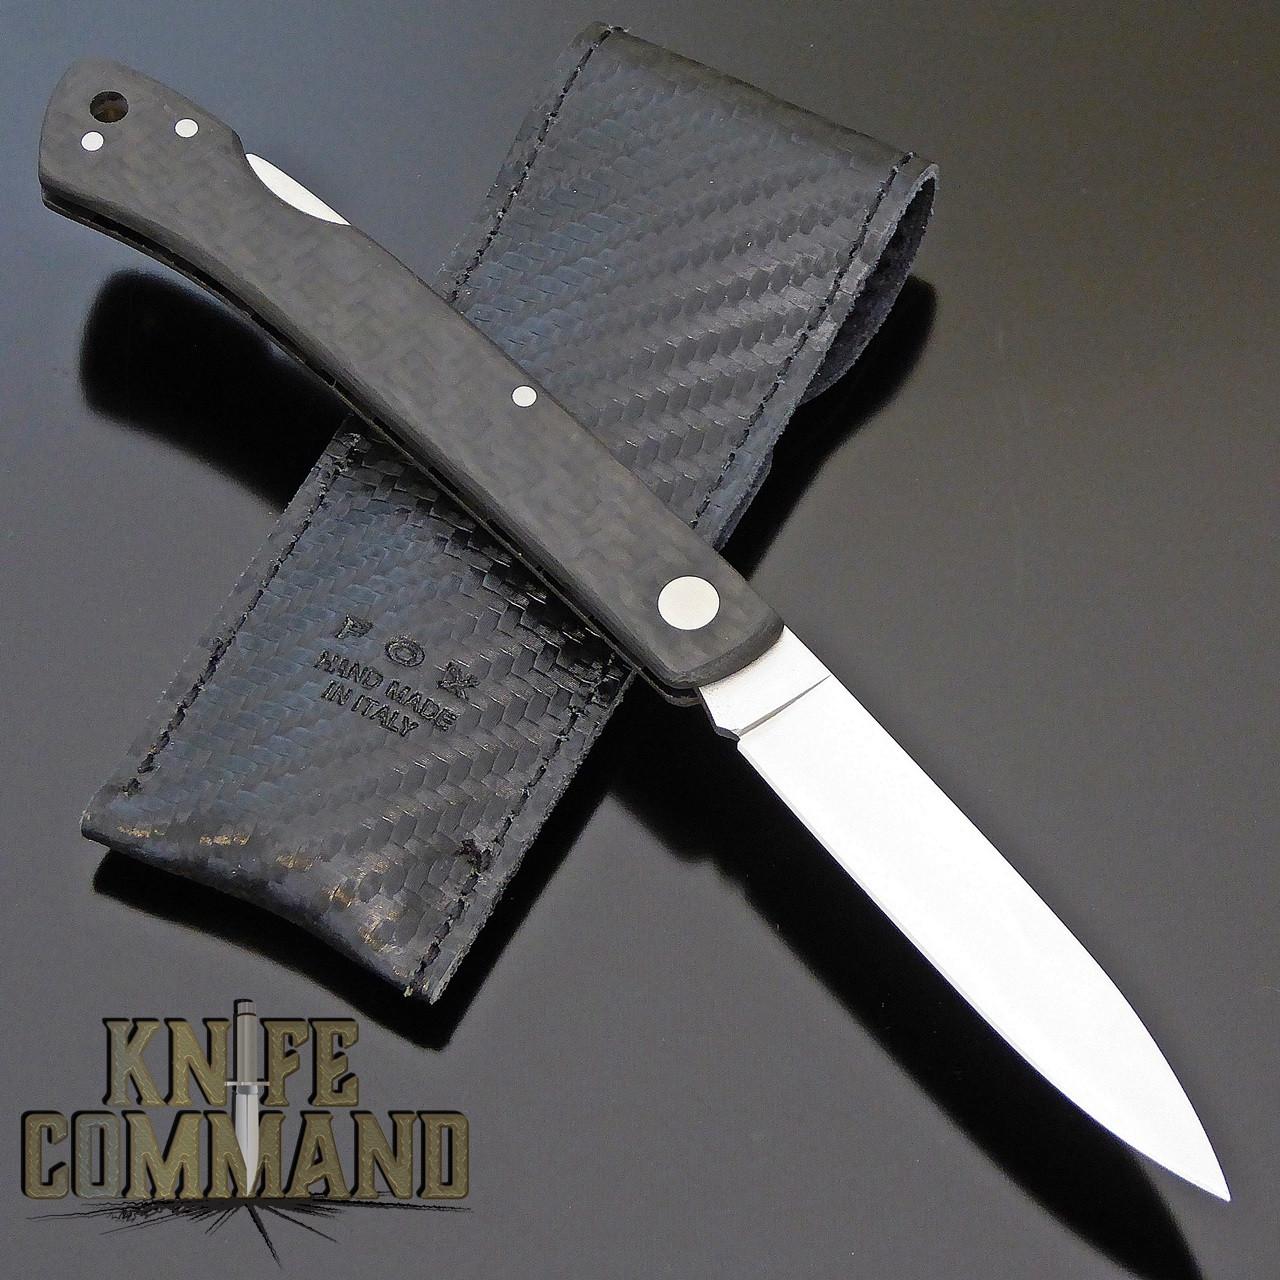 440C blade.